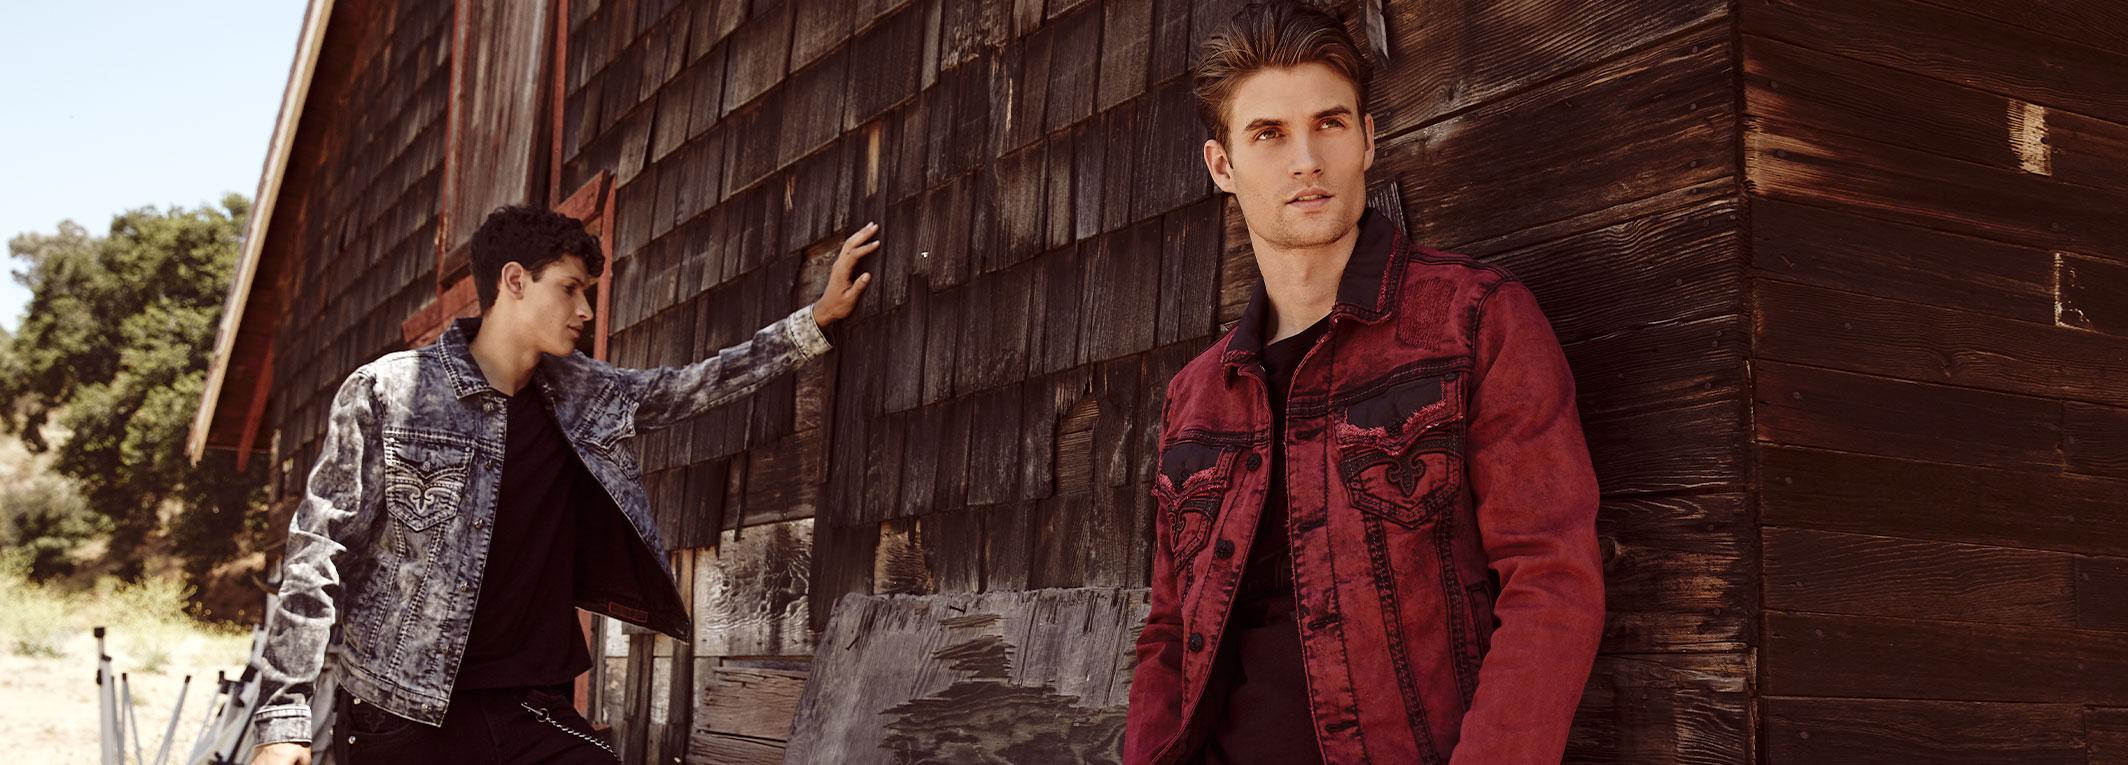 banner-category-outerwear-082019.jpg